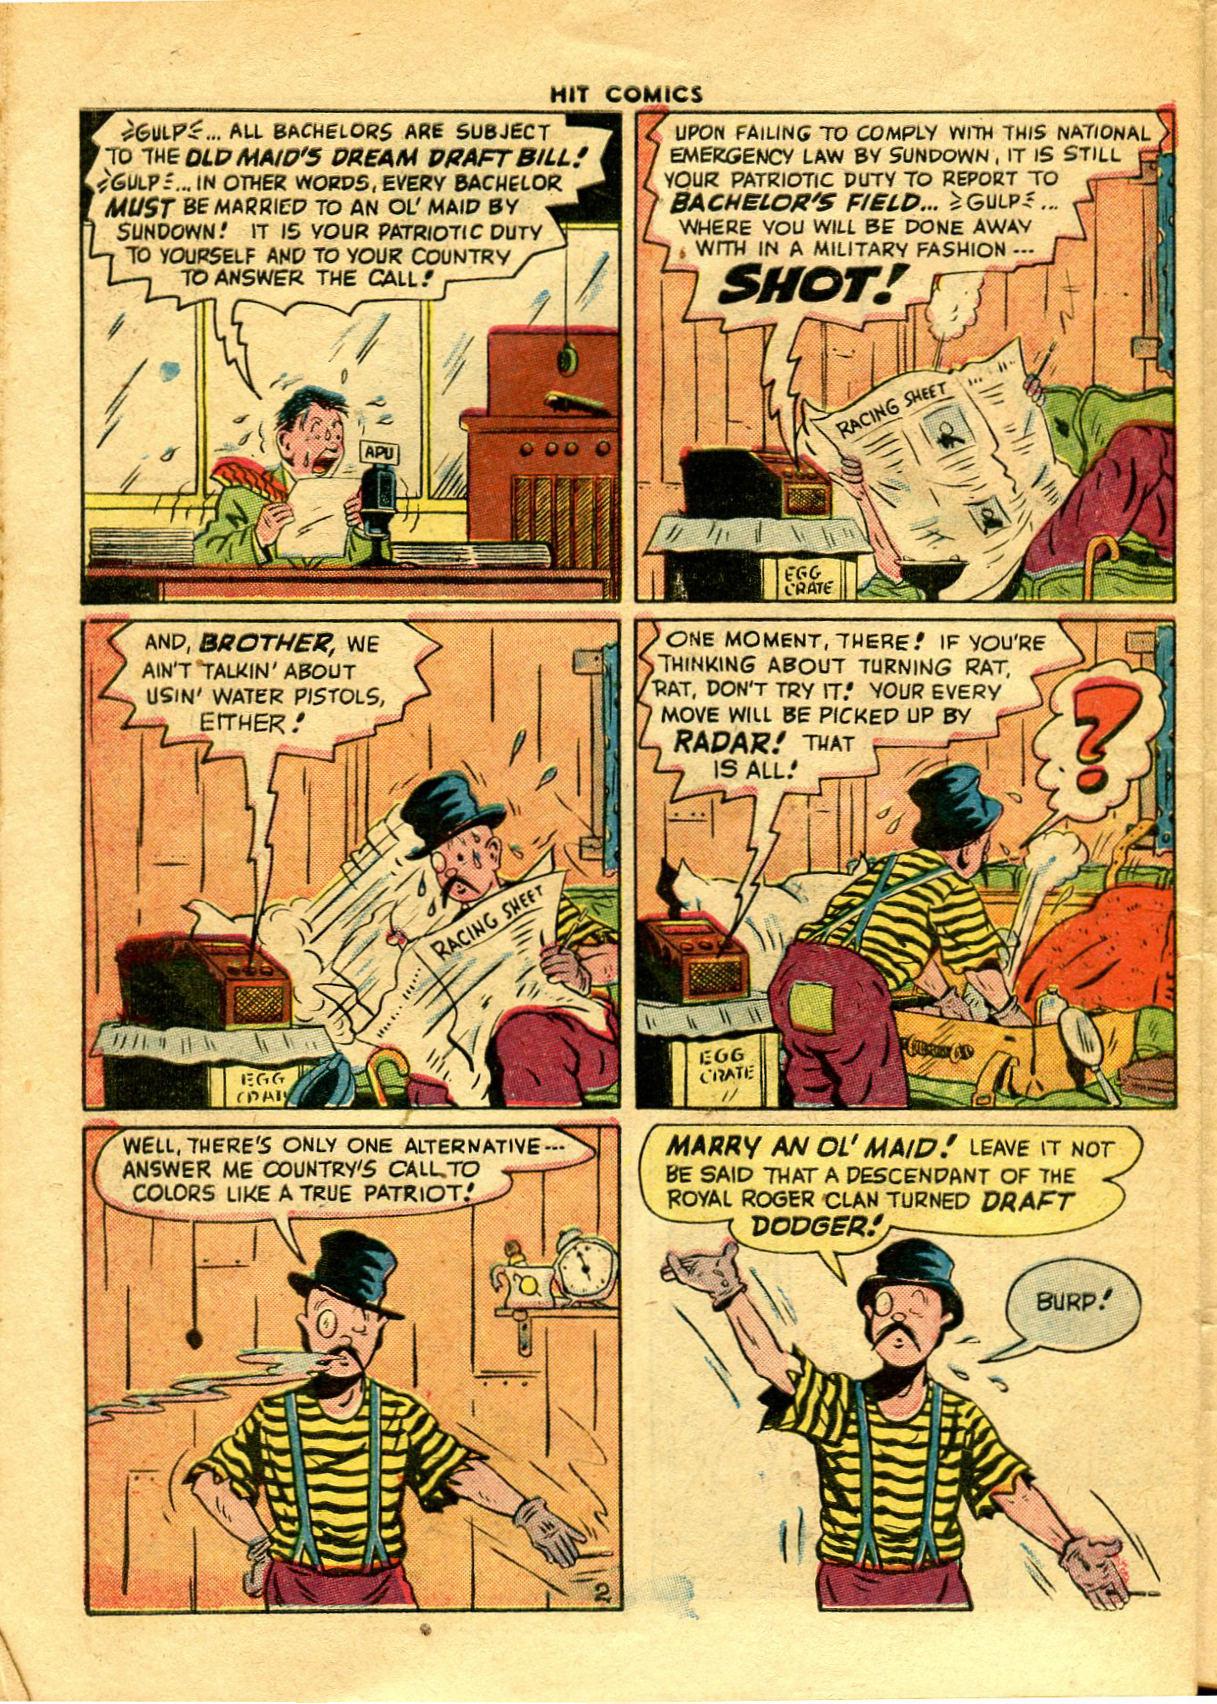 Read online Hit Comics comic -  Issue #48 - 40